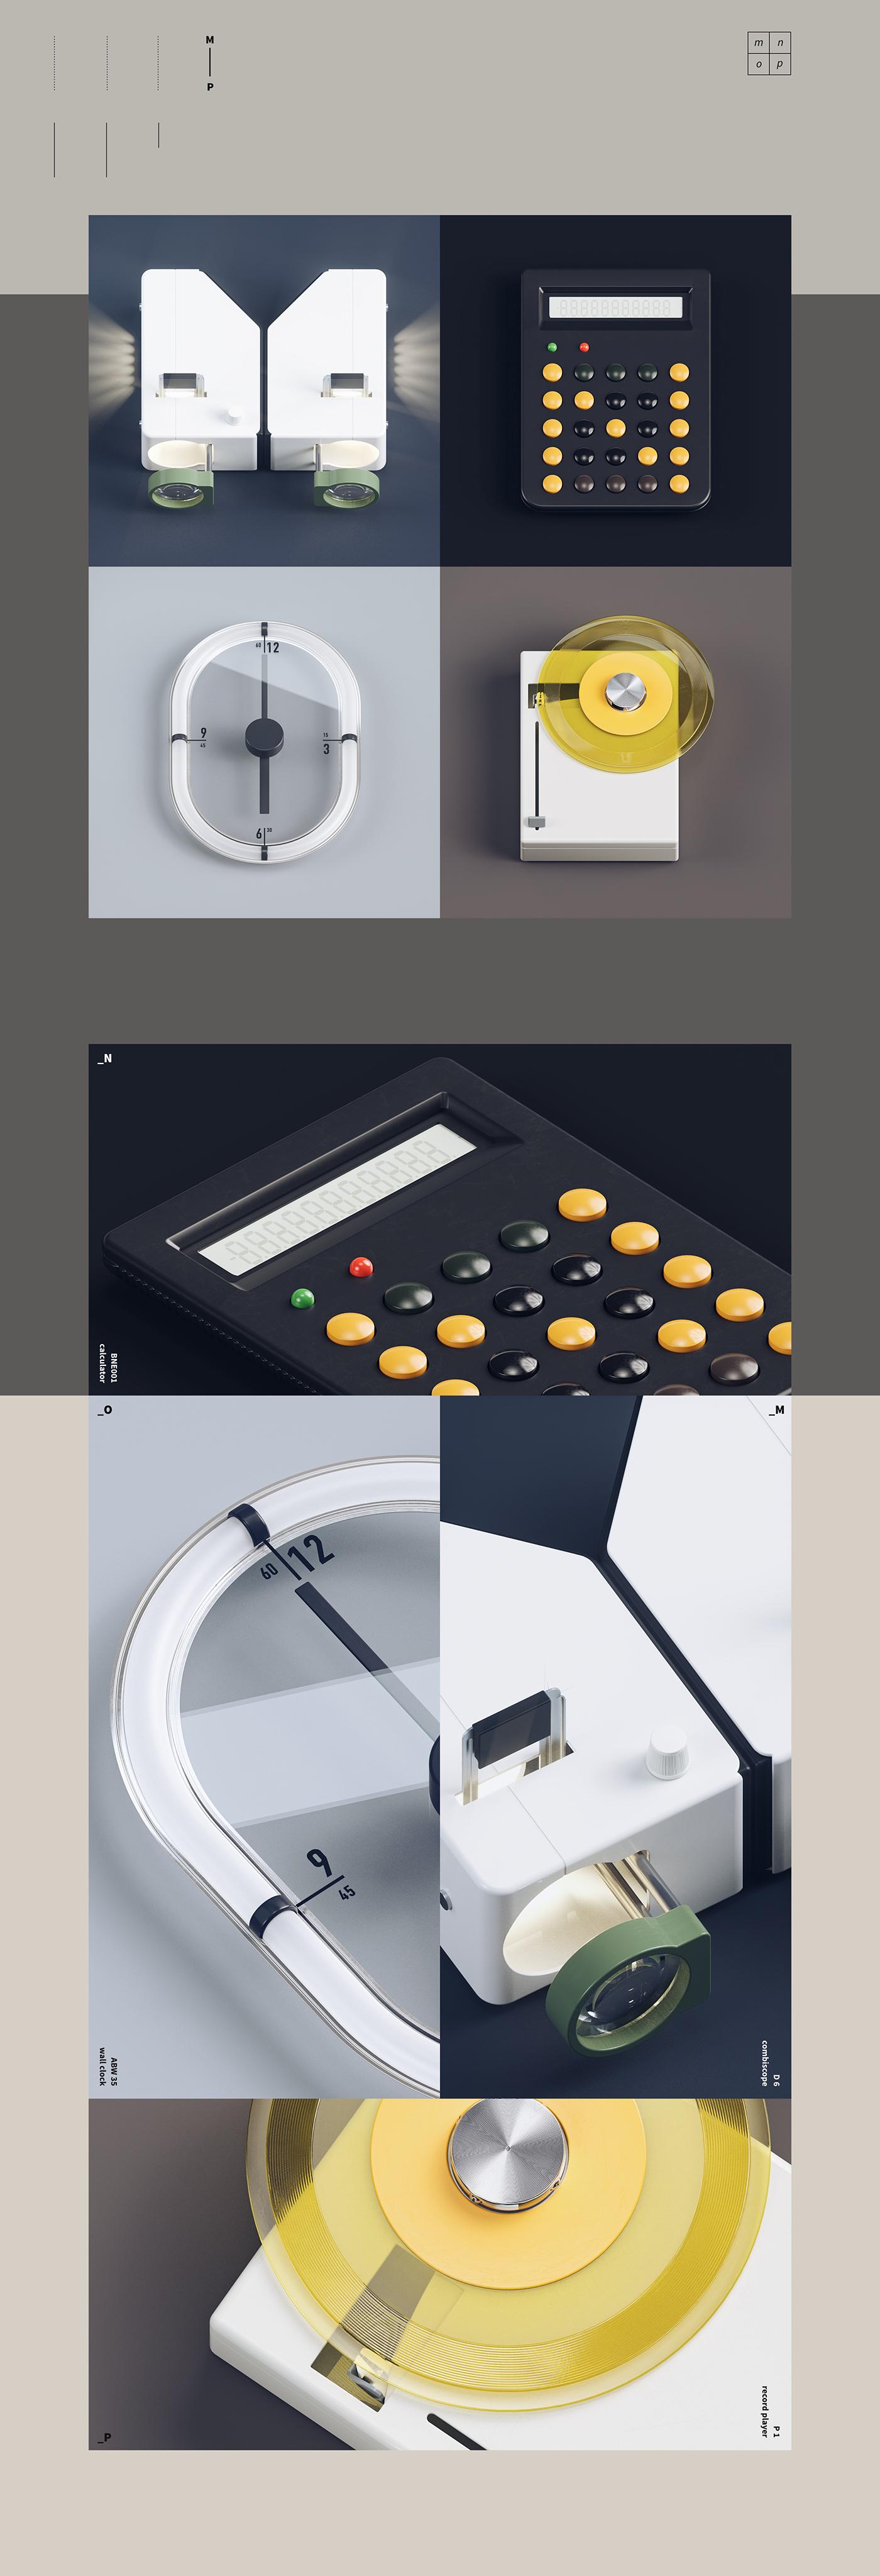 Beautiful Braun-like Style 3D Typography